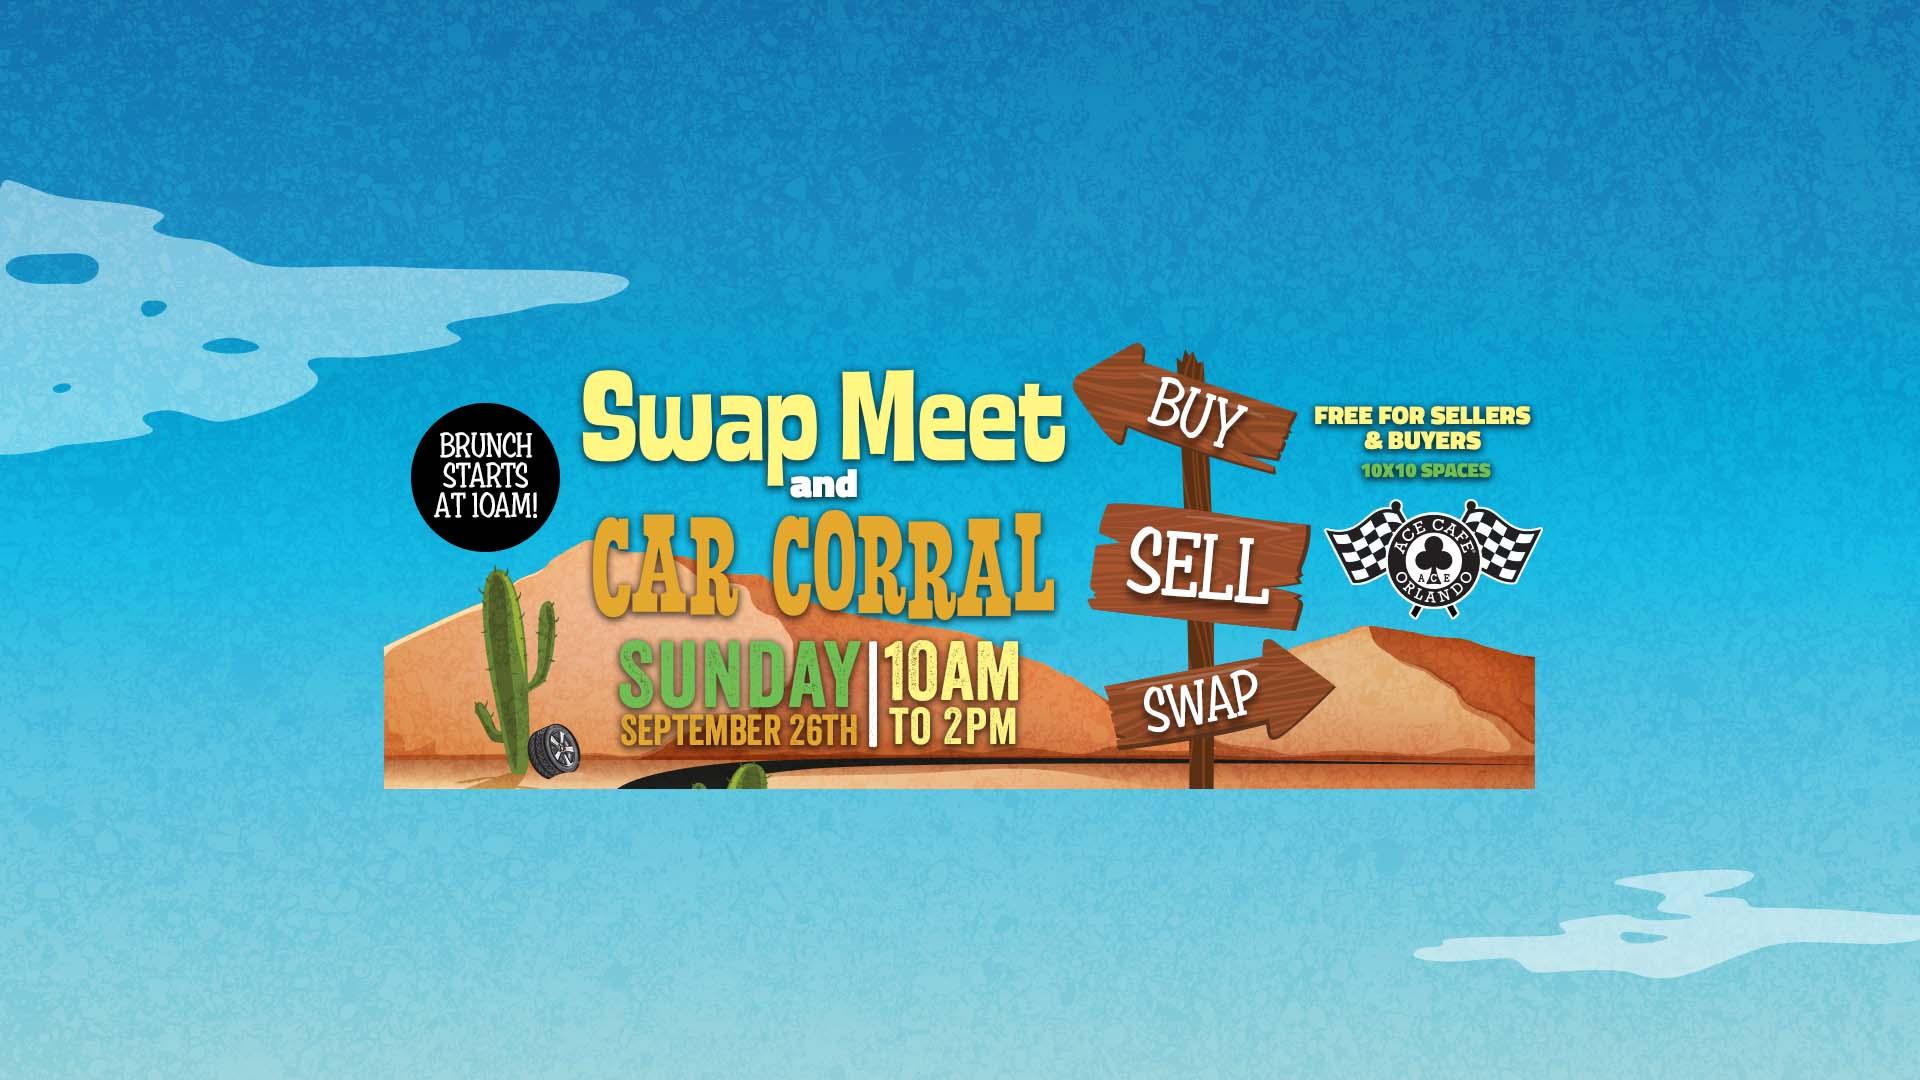 swap_meet_slider.jpg swap_meet_slider.jpg